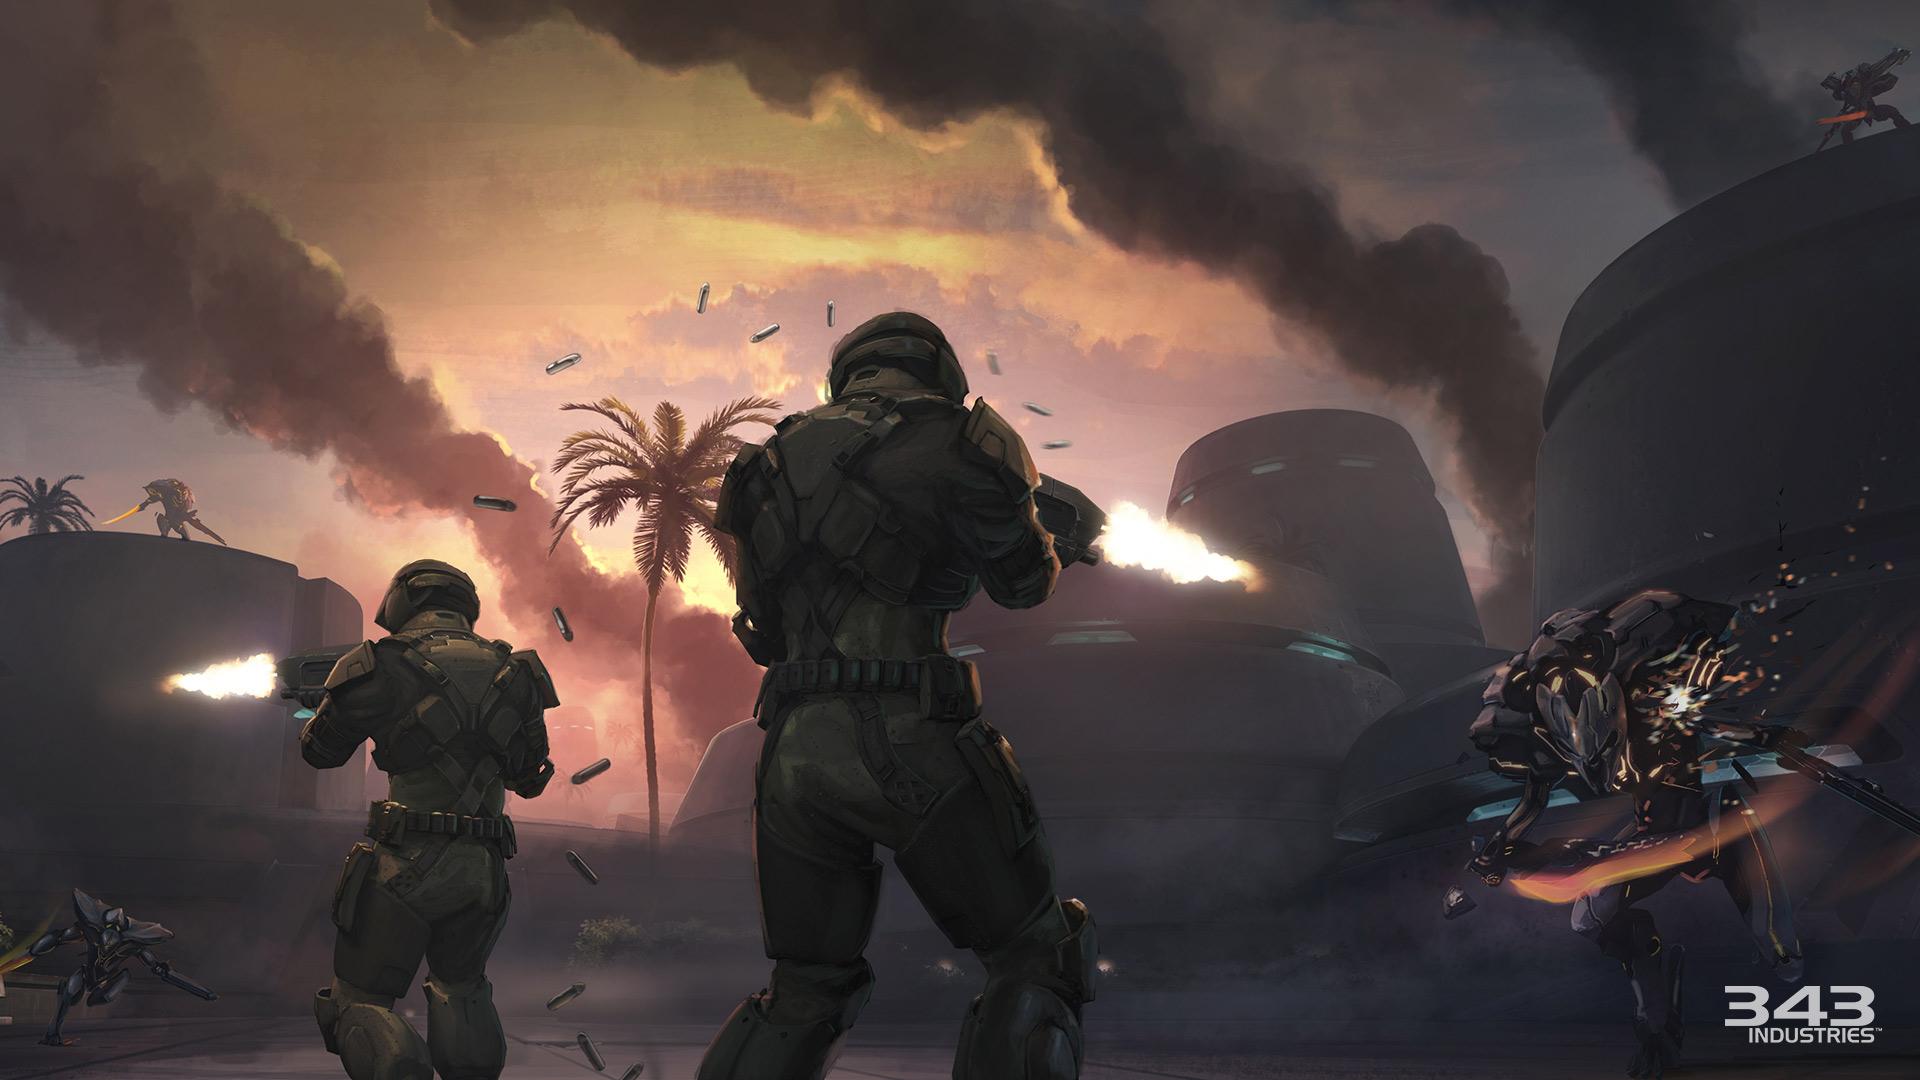 Unsc Marines Halo 2 Anniversary Halo 2 Anniversary Marine